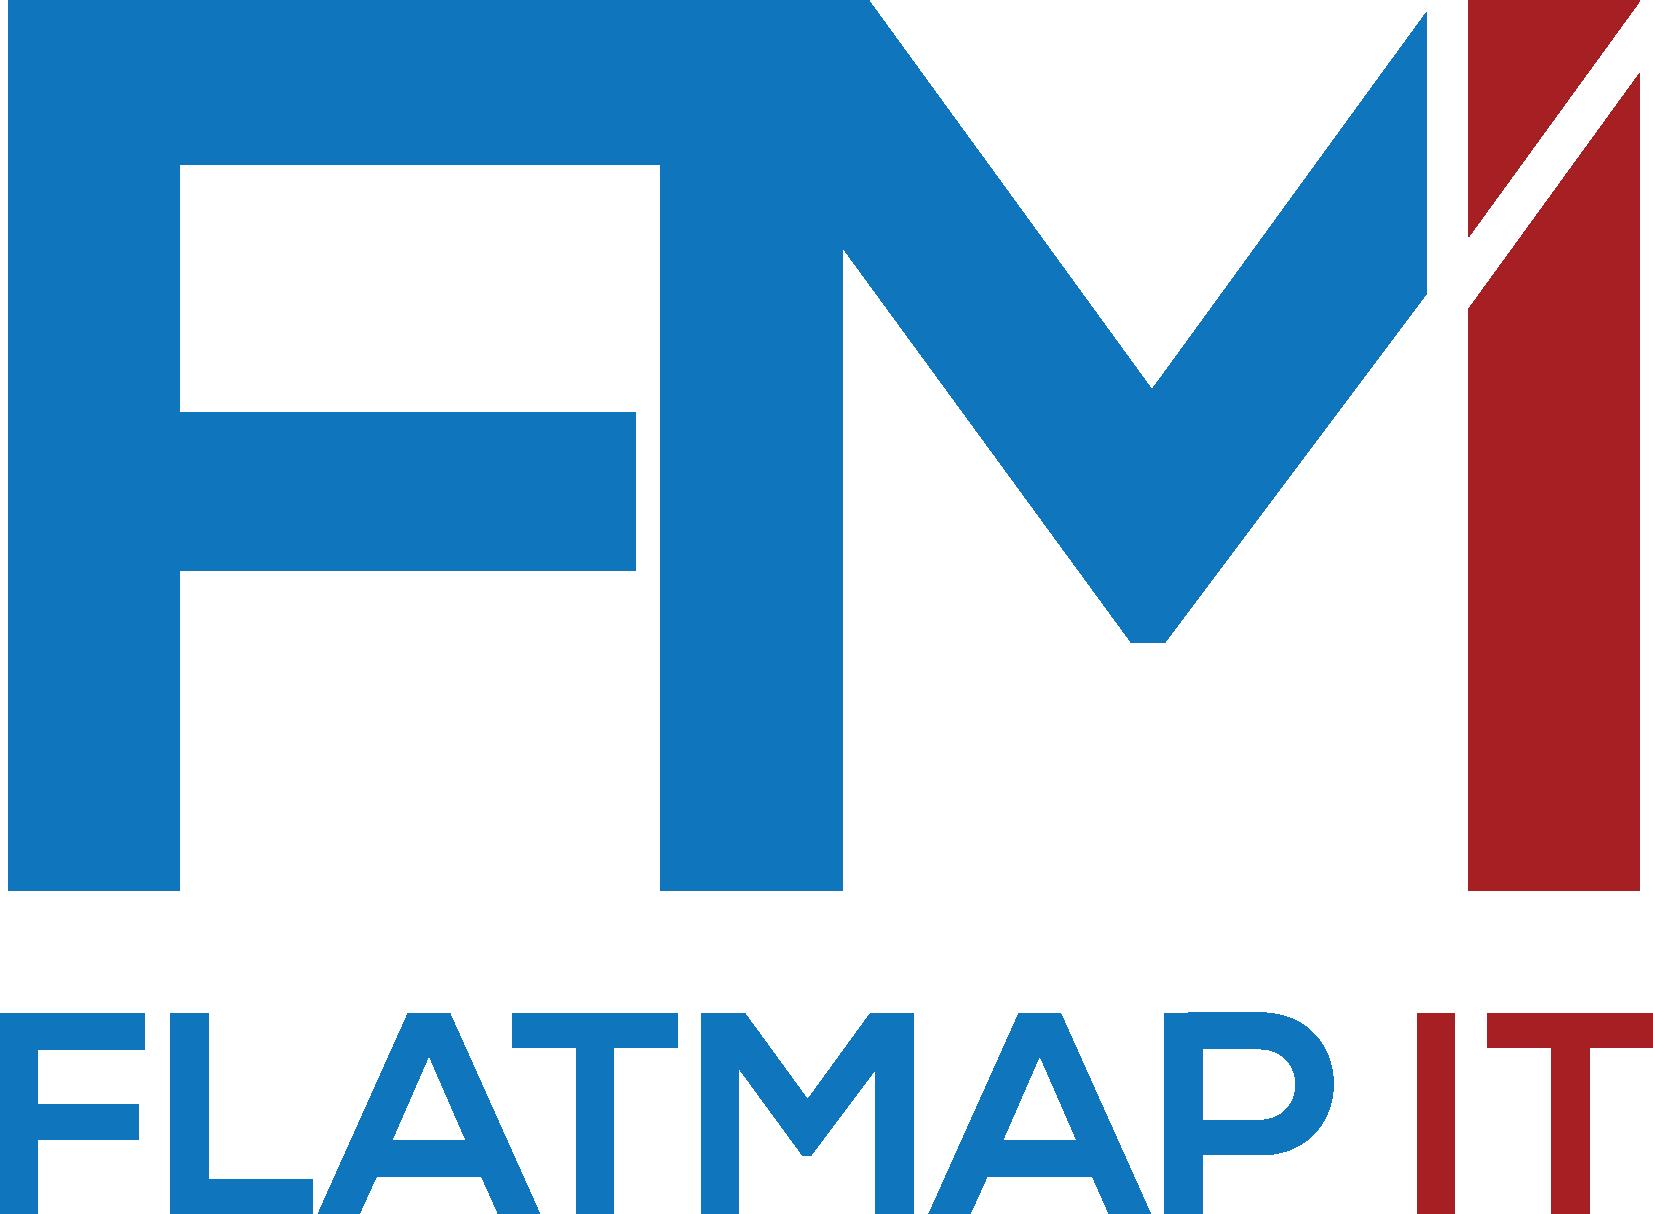 FlatMapIT